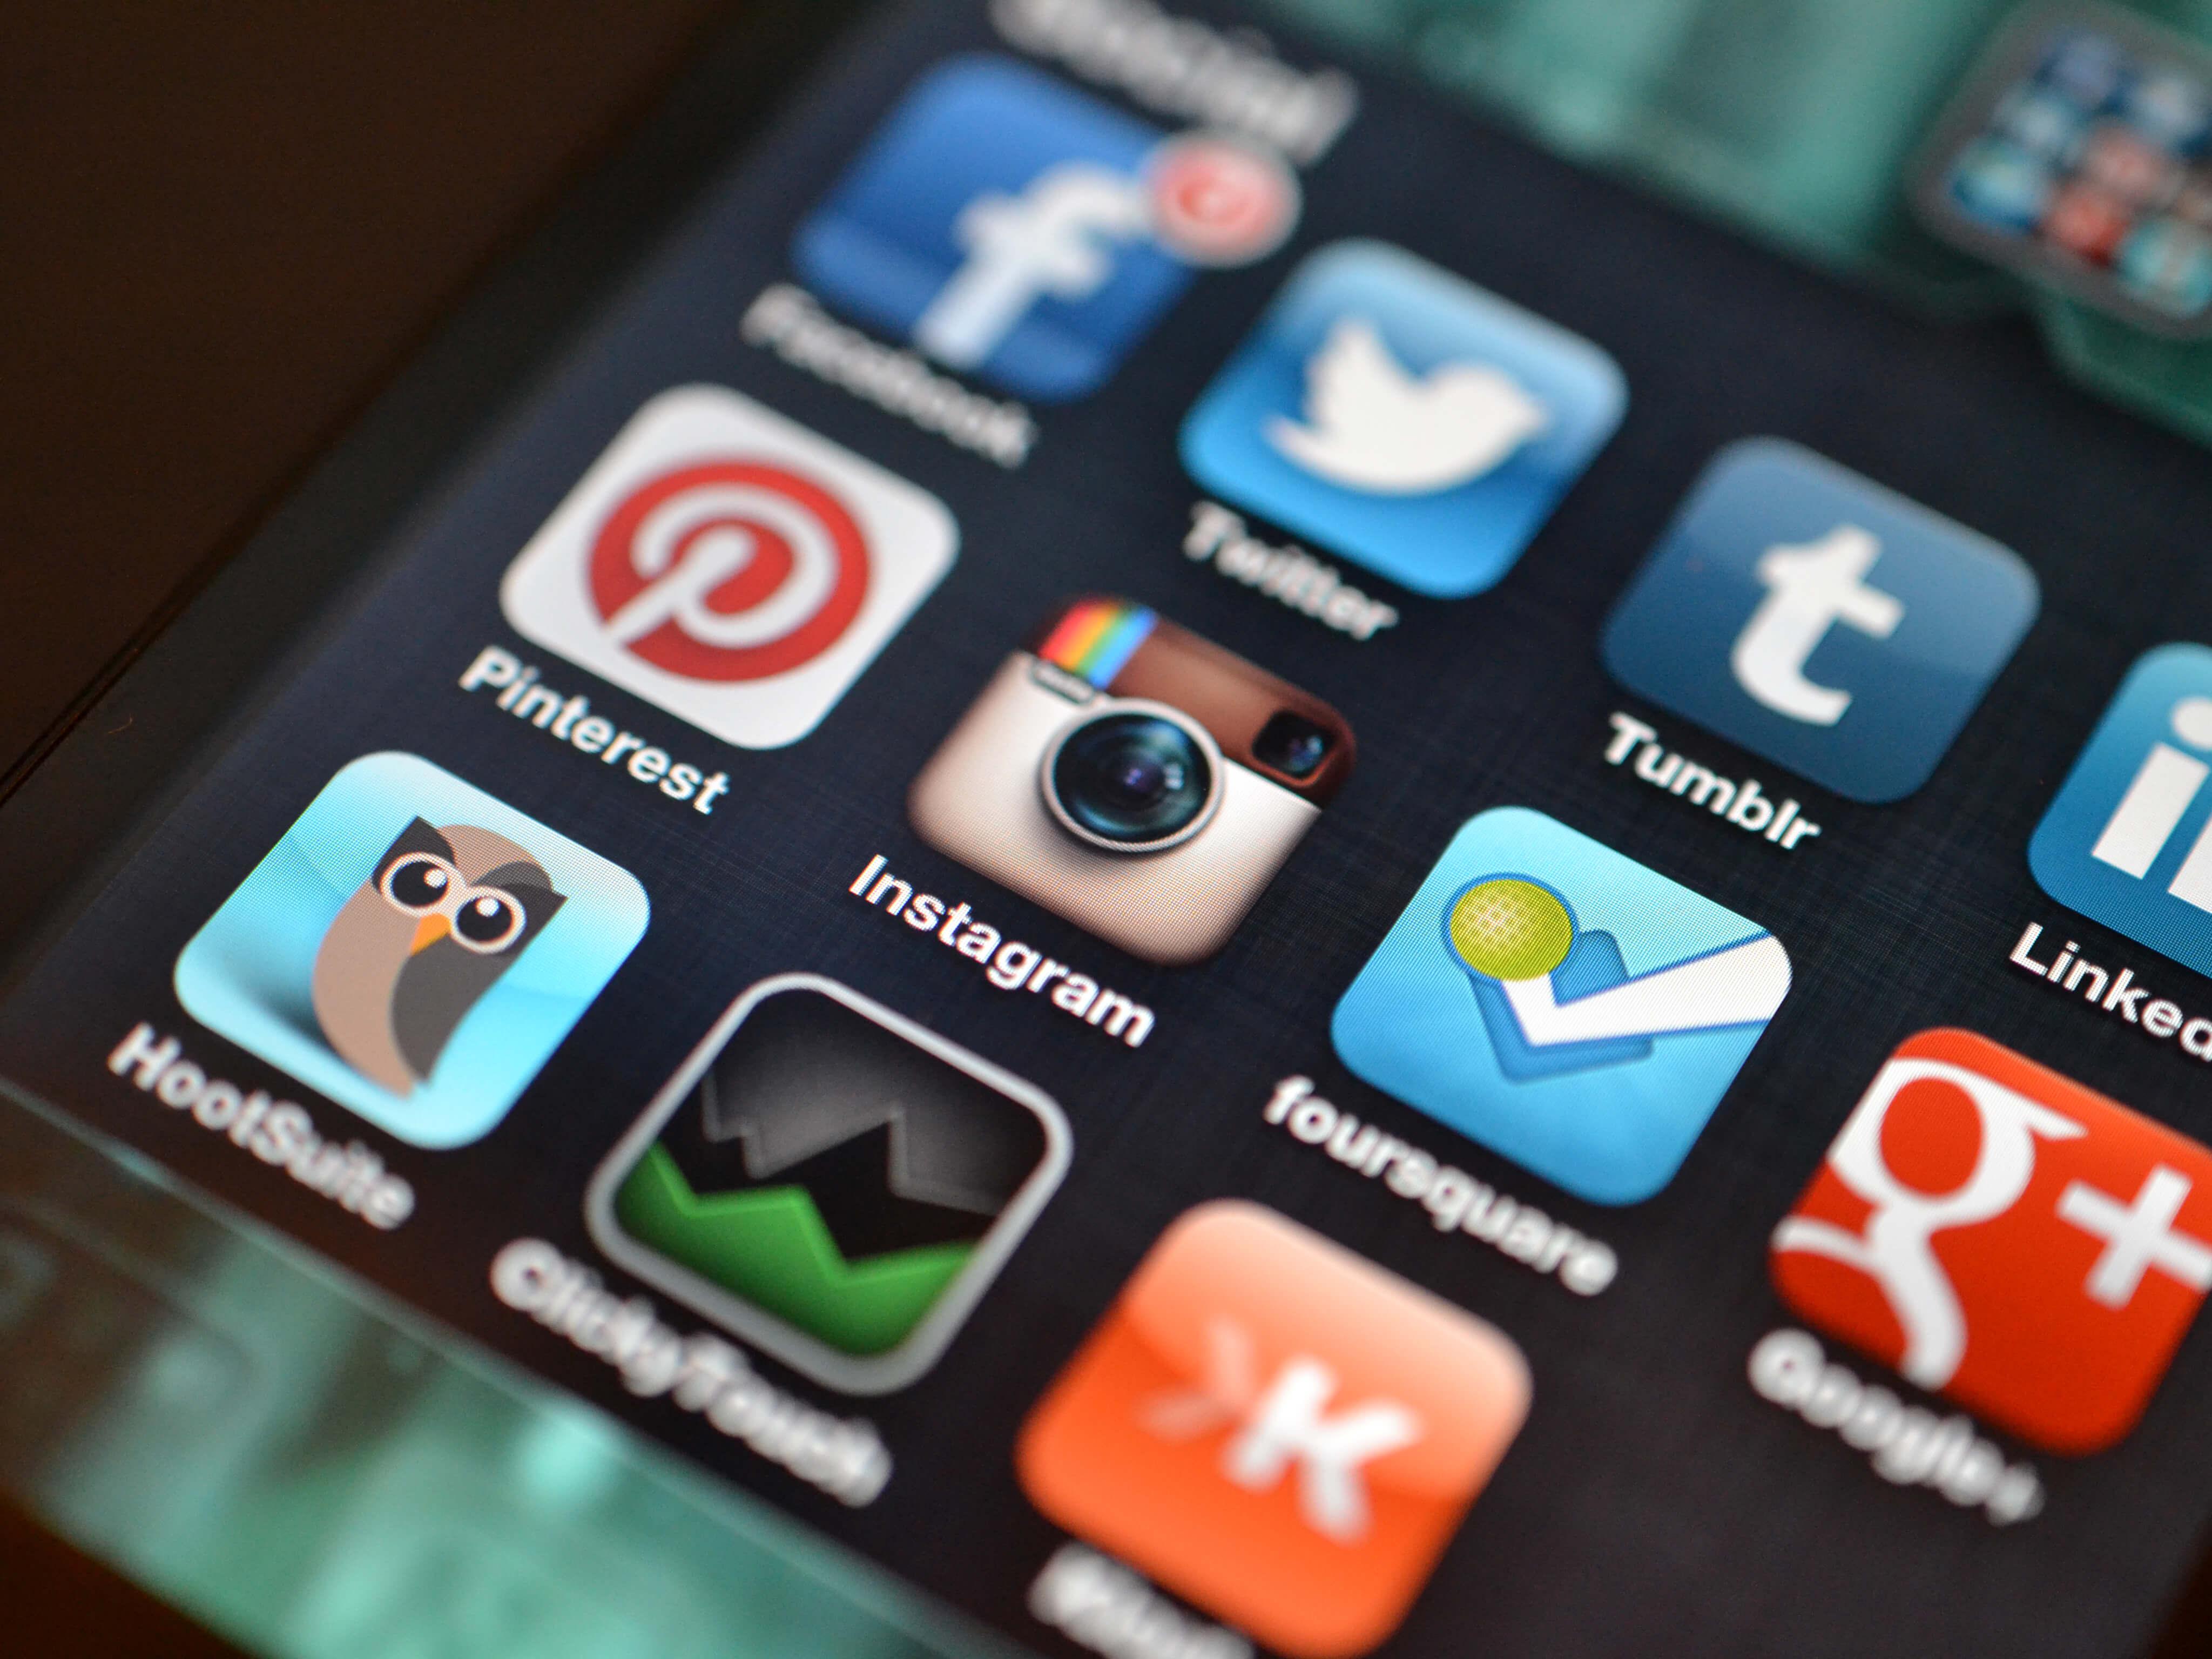 icerik pazarlamada sosyal medya plani